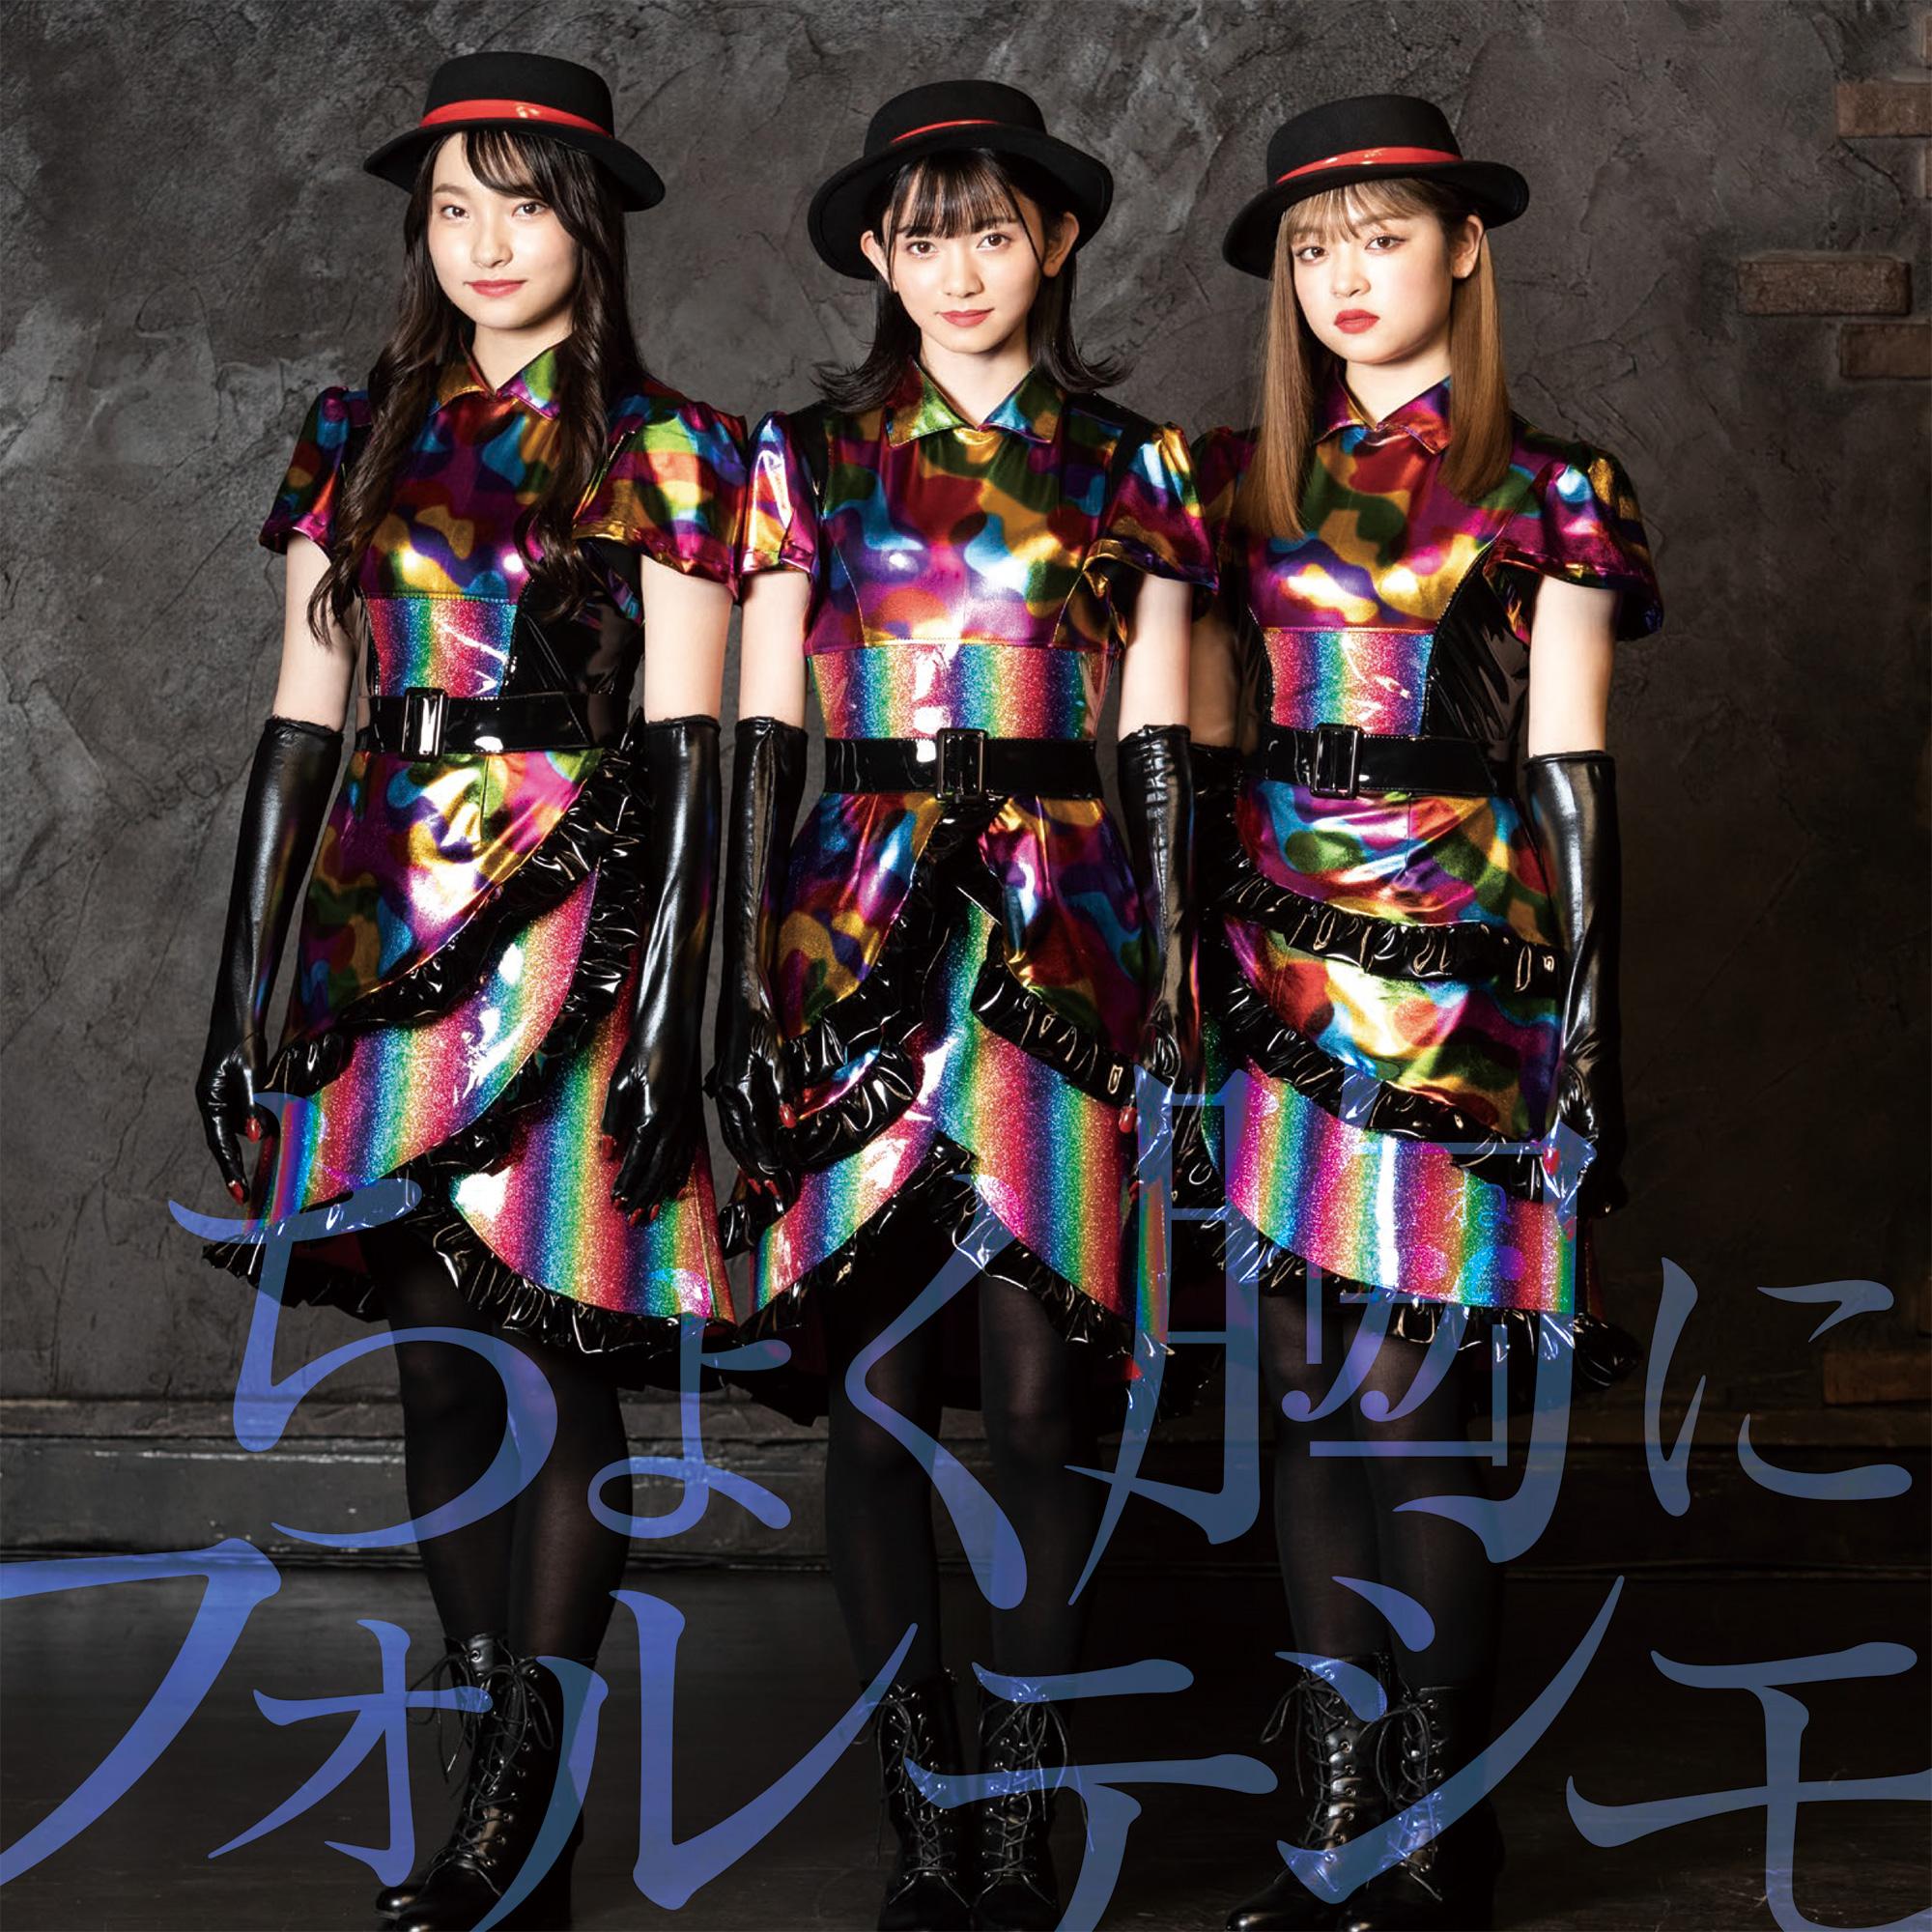 Task have Fun「ちょく胸にフォルテシモ」|2021.4.28 『つん♂タス♀』2ndシングル